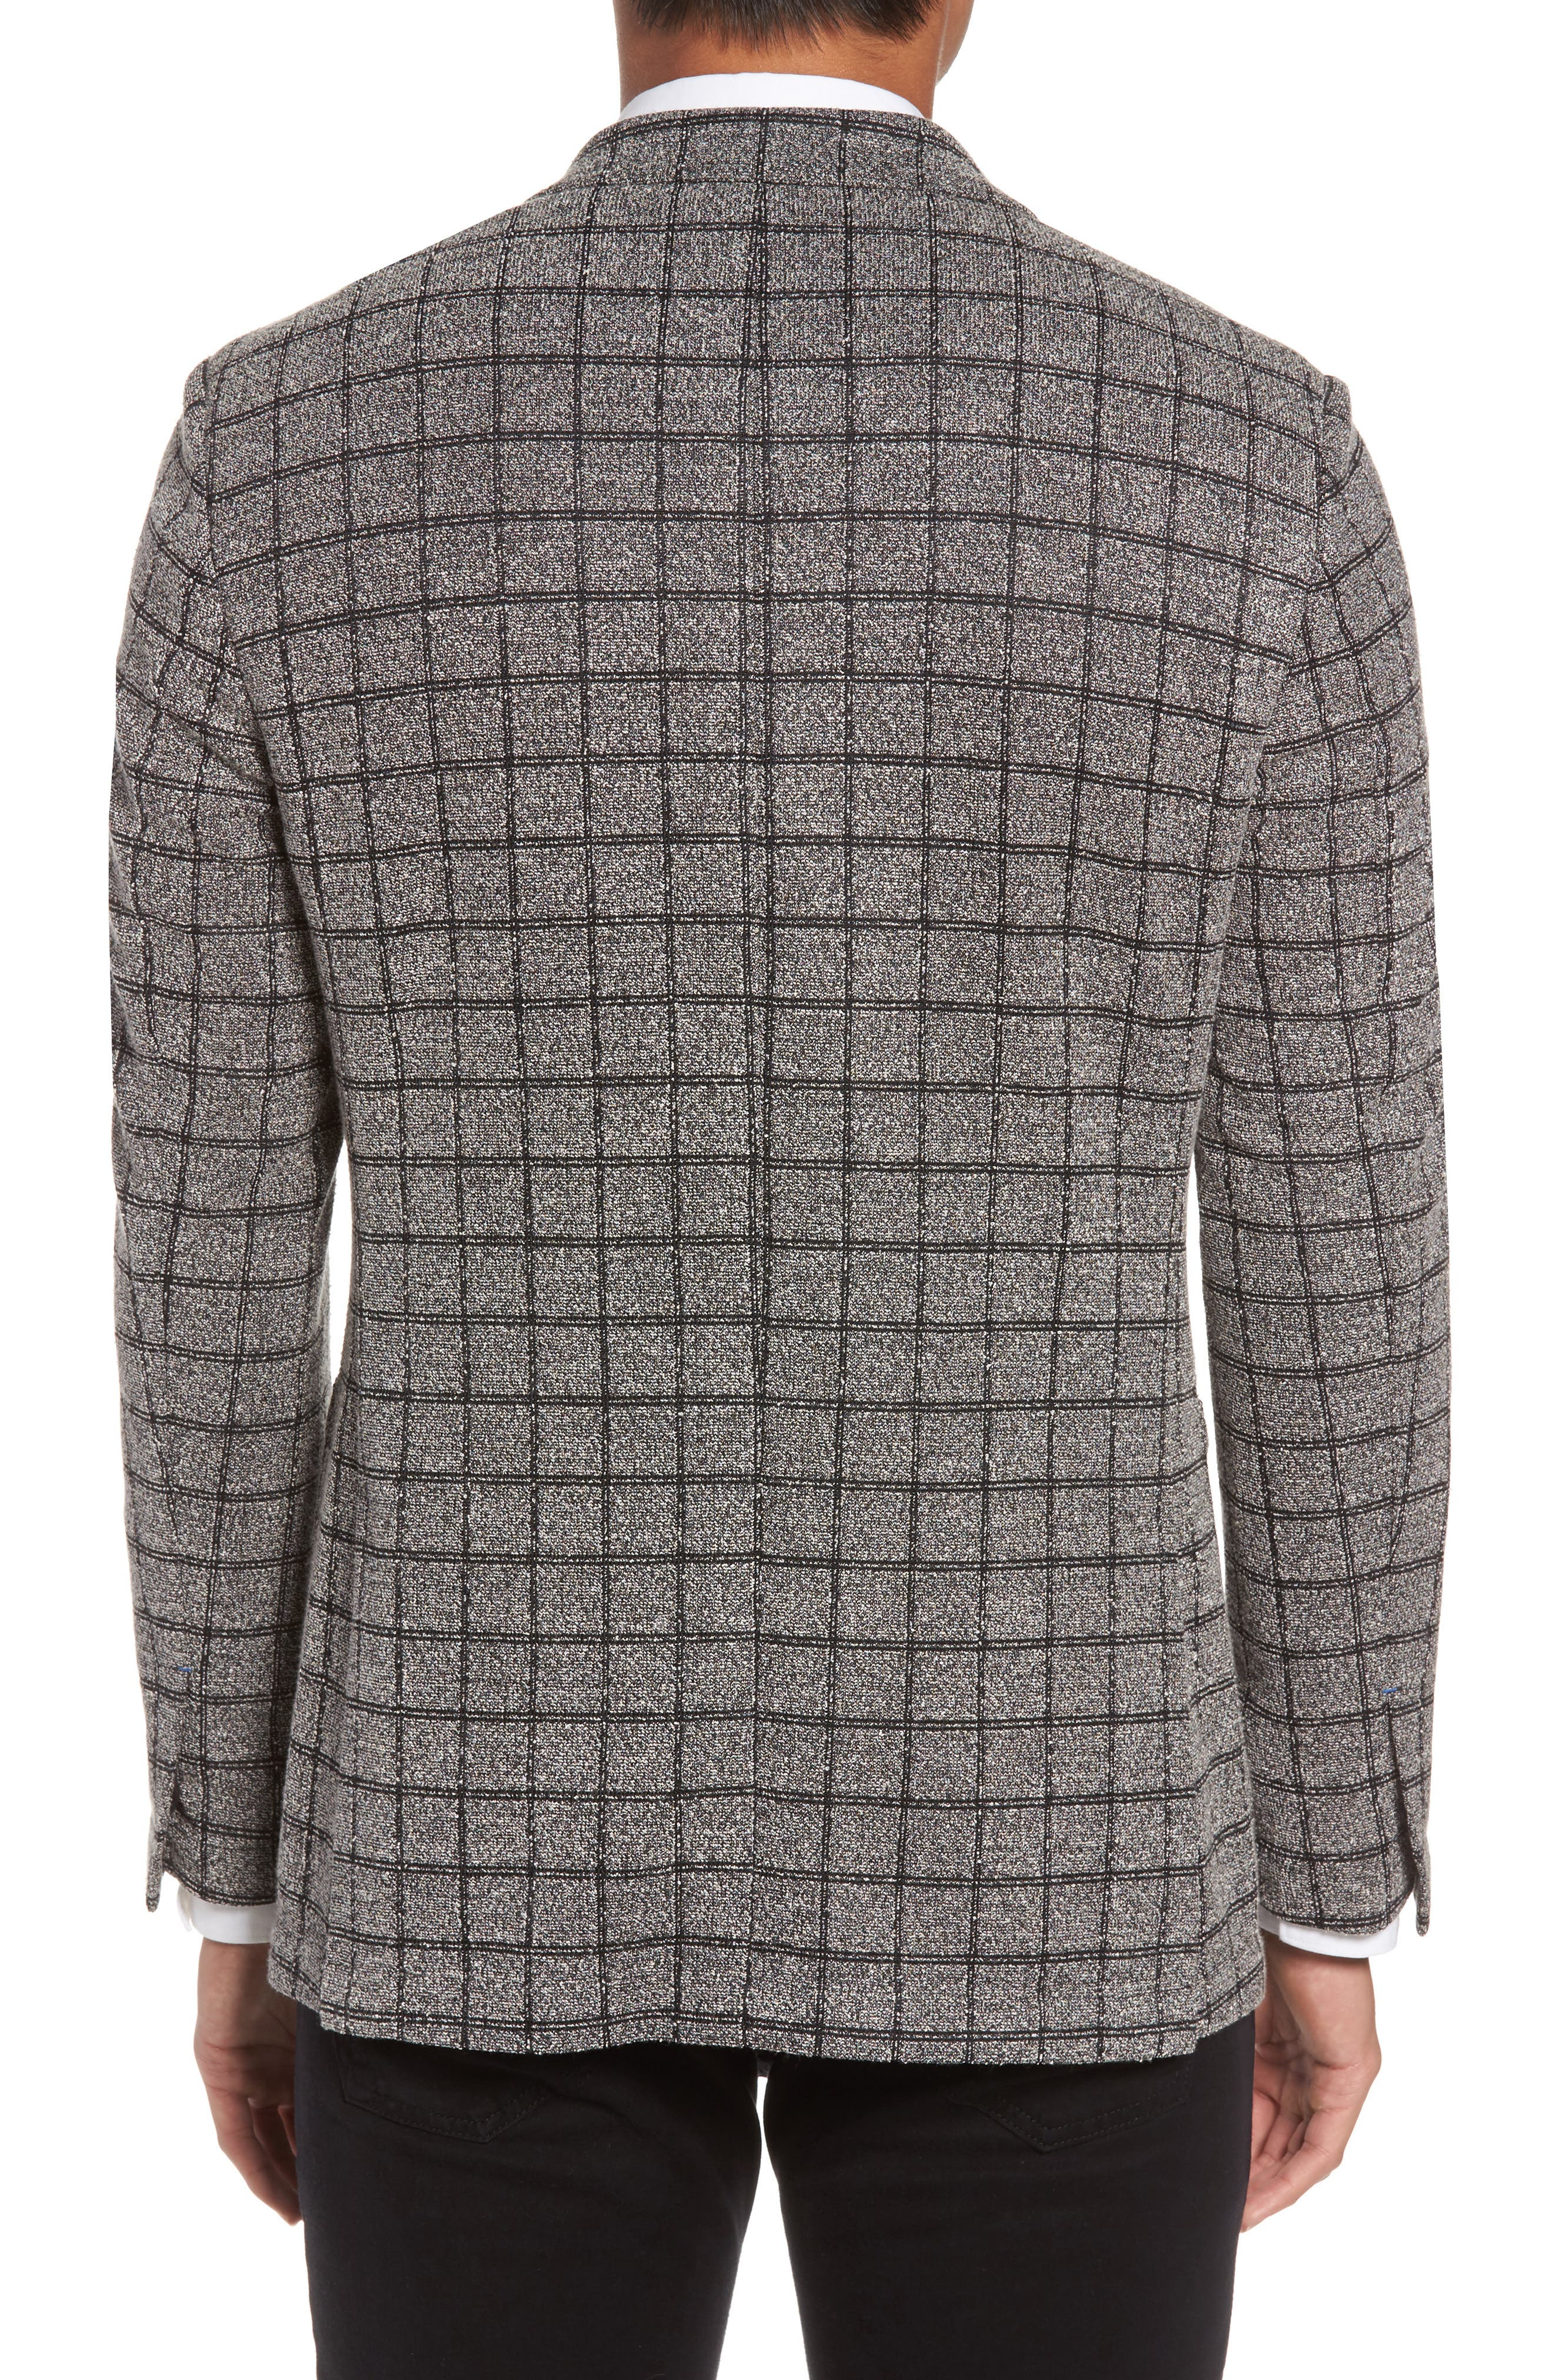 Del Aria Slim Fit Check Knit Jacket,                             Alternate thumbnail 2, color,                             020